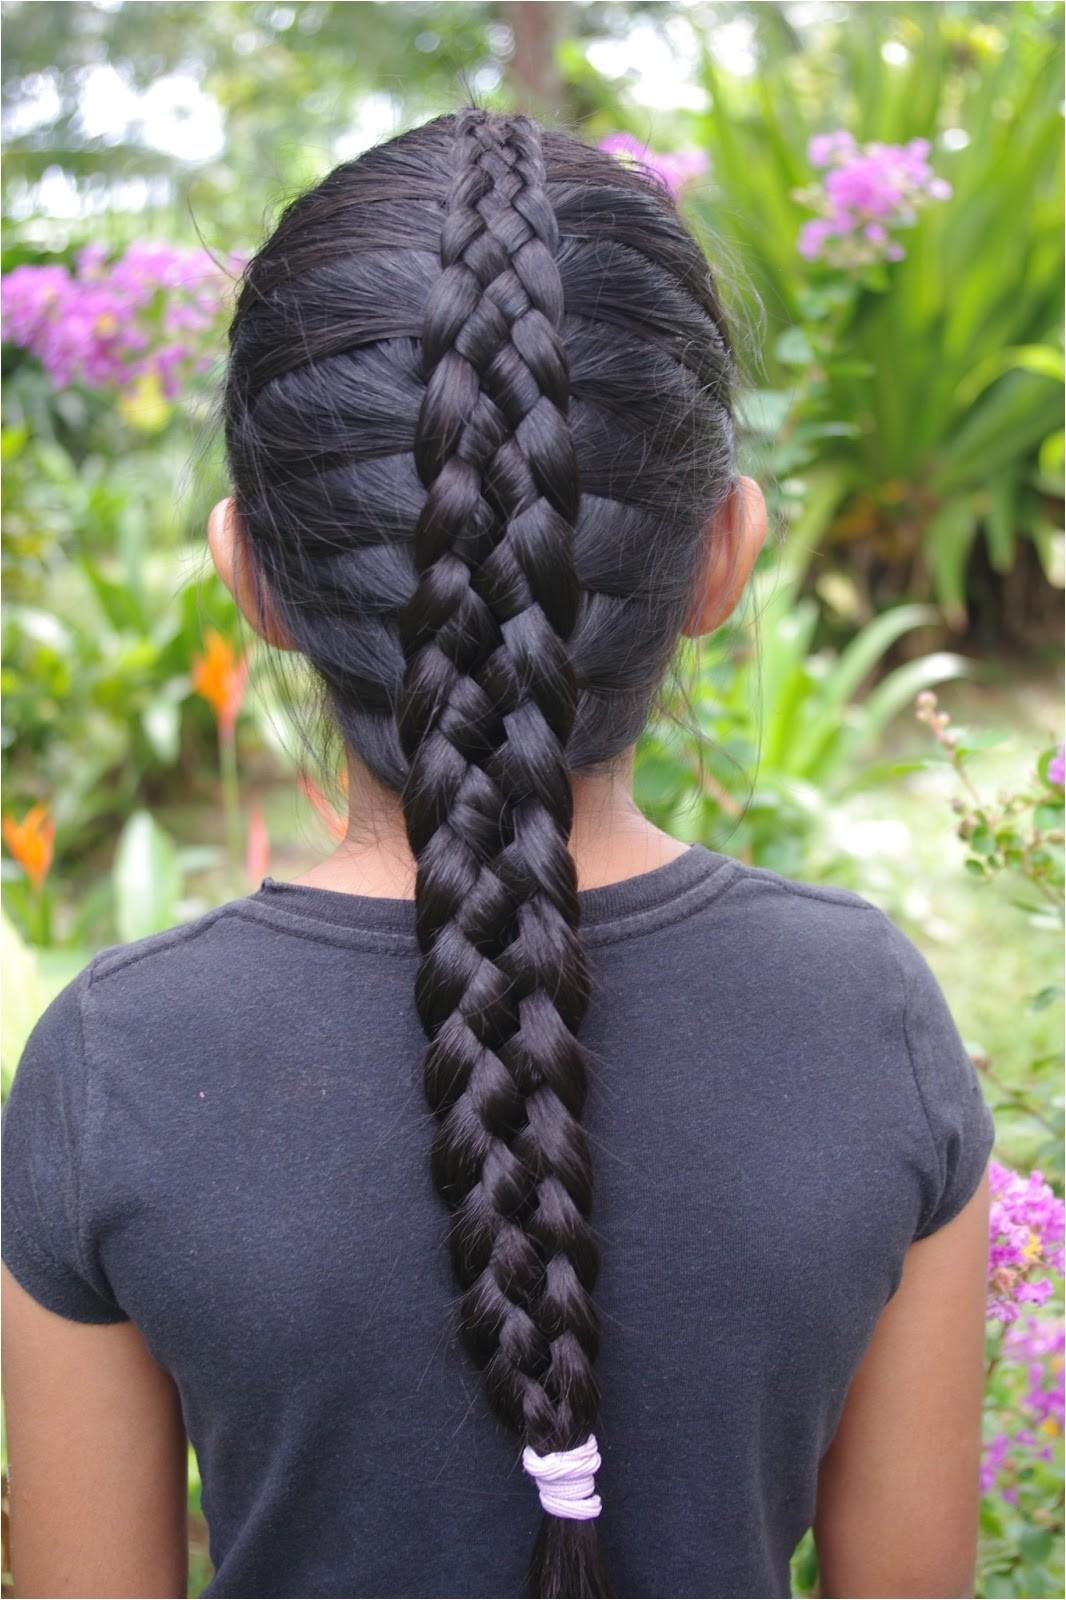 micronesian girl 6 strand french braid